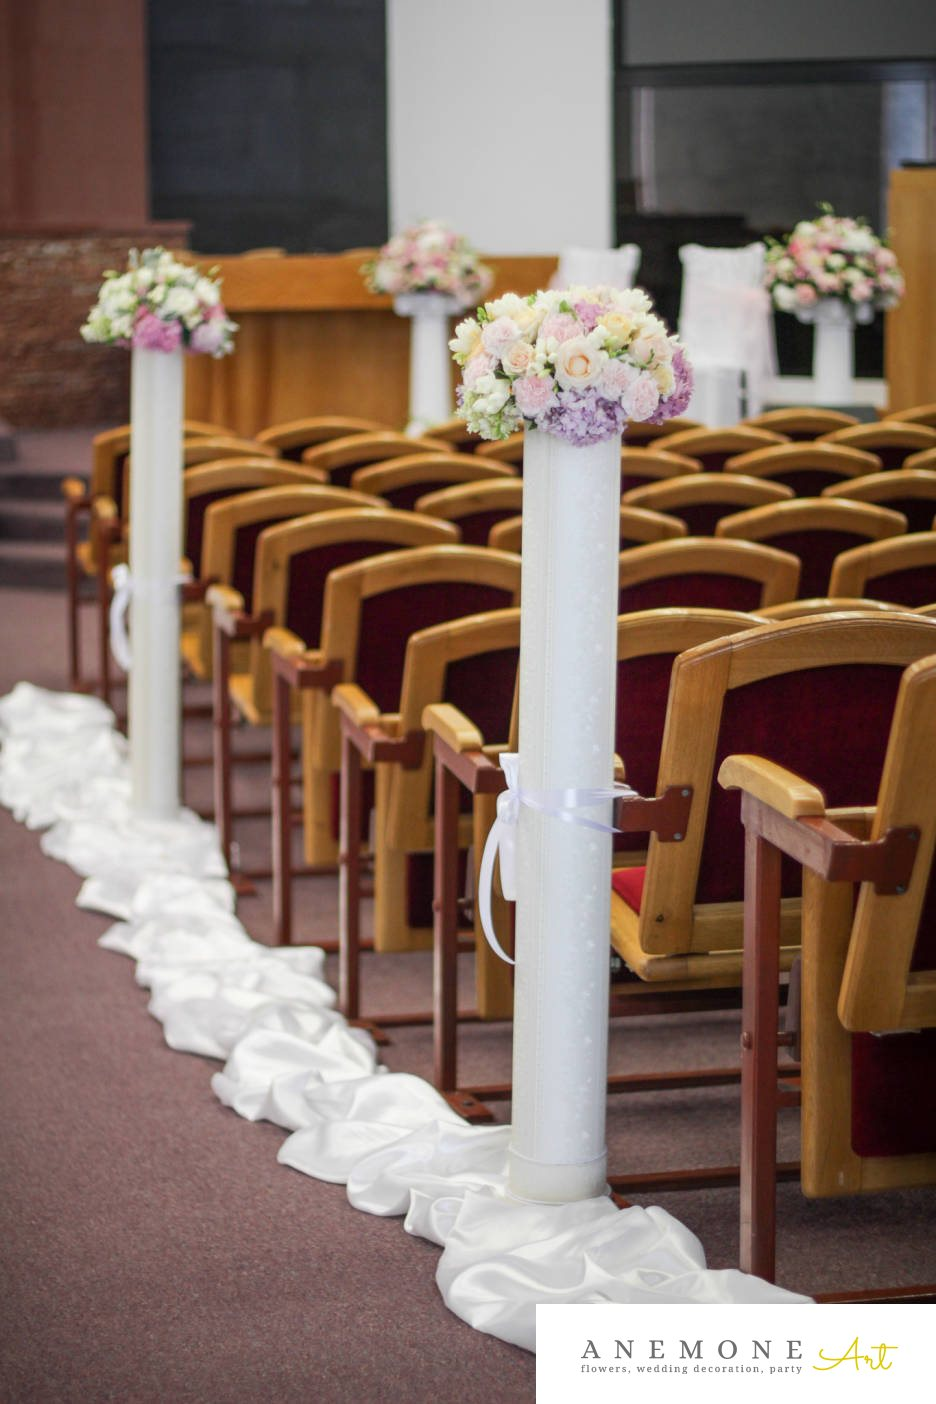 Poza, foto cu Flori de nunta alb, dalia, decor biserica, hortensia, lisianthus, roz in Arad, Timisoara, Oradea (wedding flowers, bouquets) nunta Arad, Timisoara, Oradea